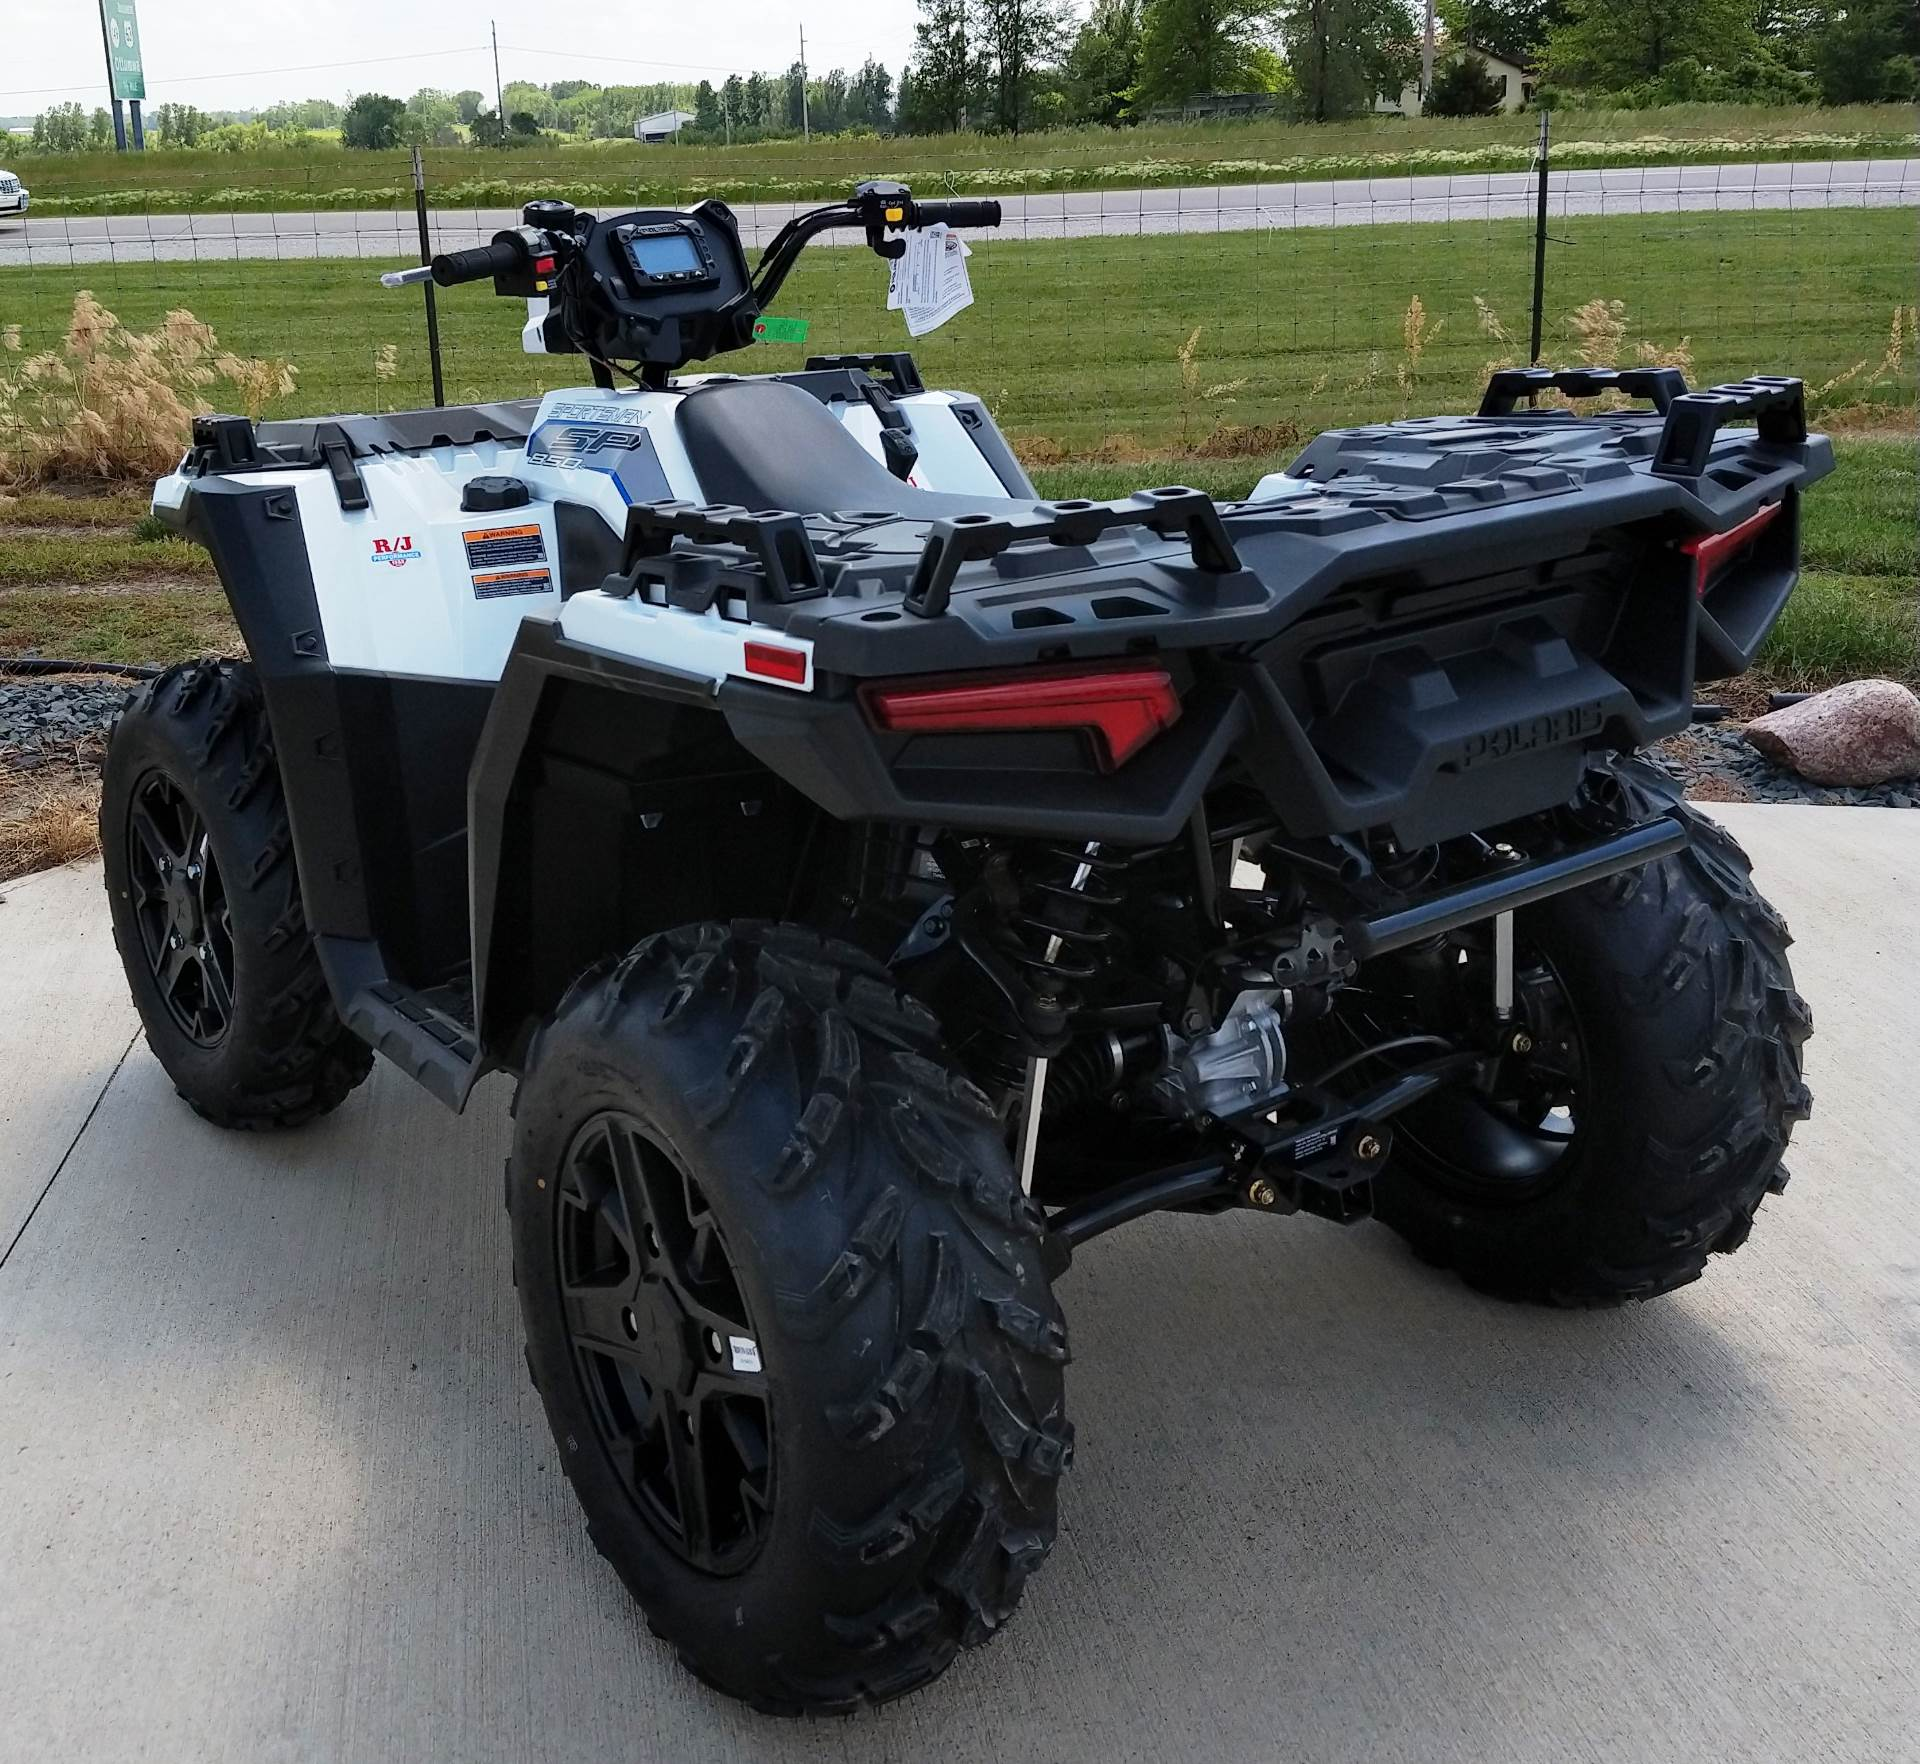 2019 Polaris Sportsman 850 SP in Ottumwa, Iowa